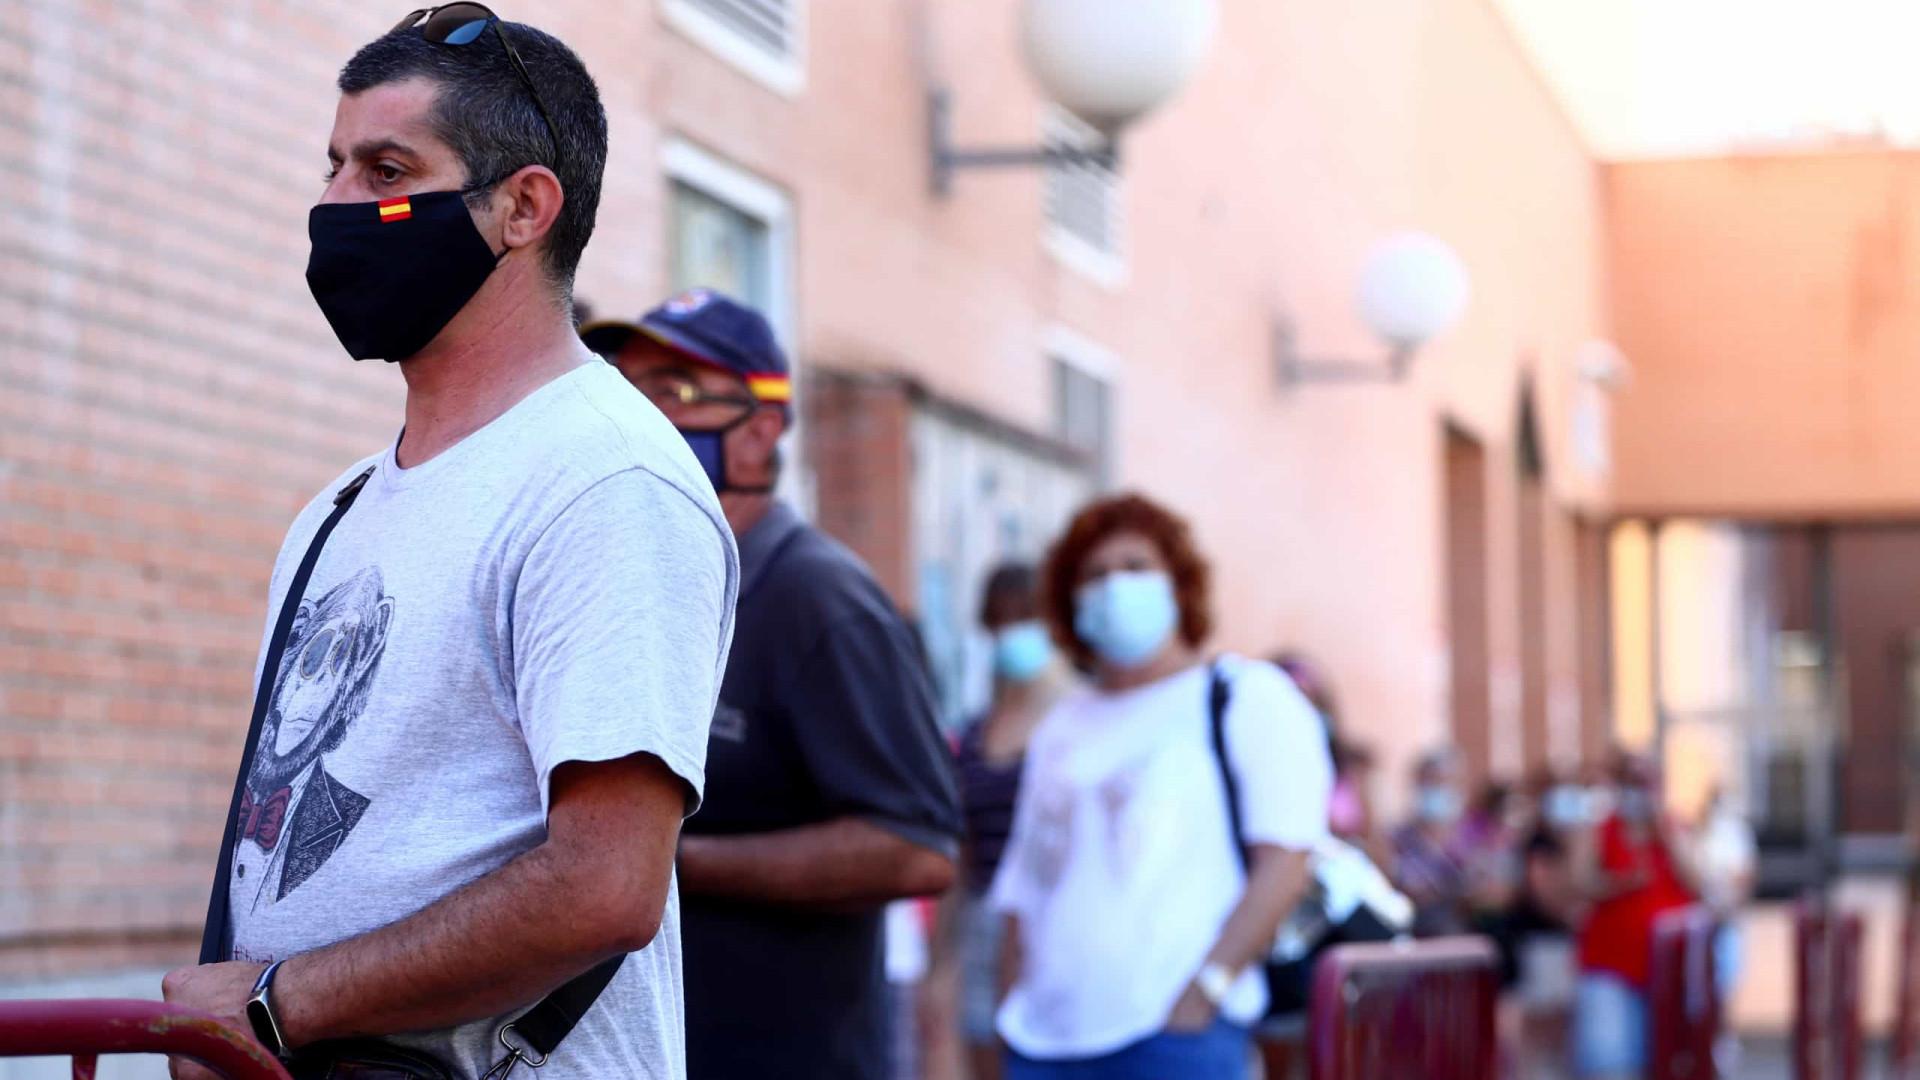 Espanha ultrapassa os 600 mil contágios e os 30 mil óbitos